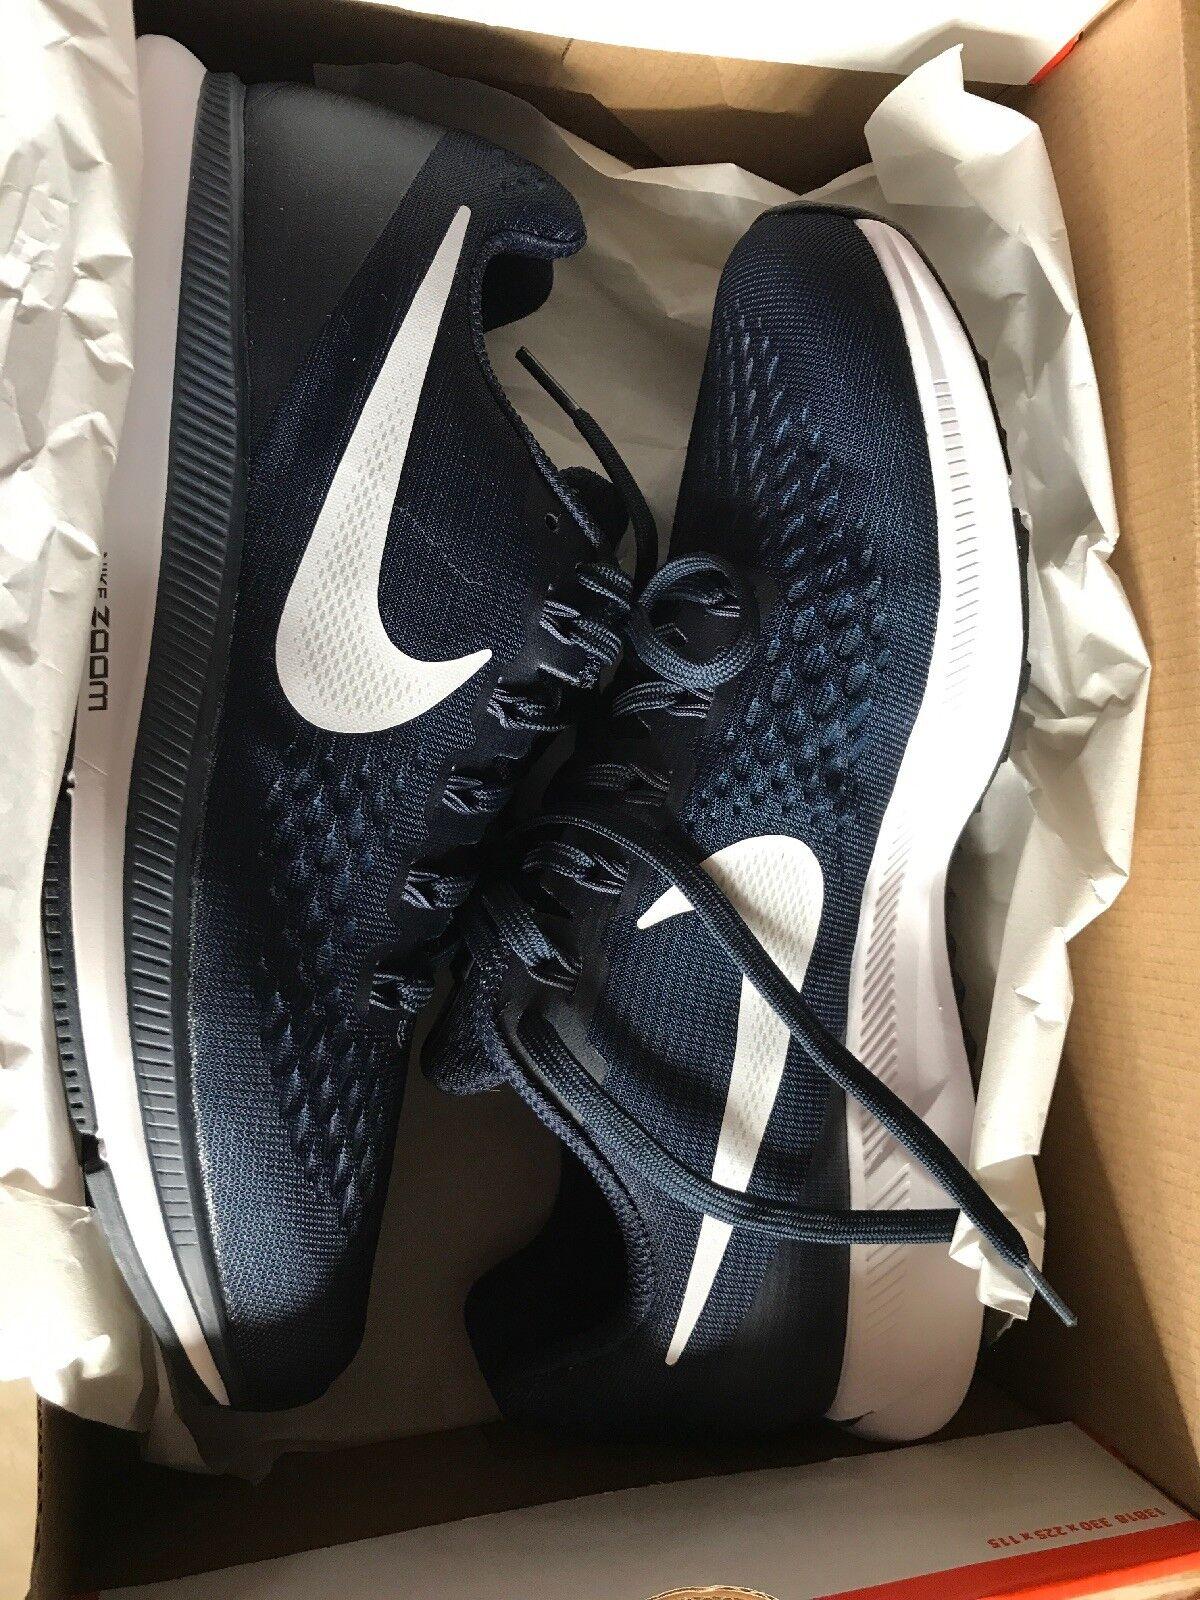 NEW Nike Air Zoom Pegasus 34 Men's Running shoes Obsidian White Sz 8.5